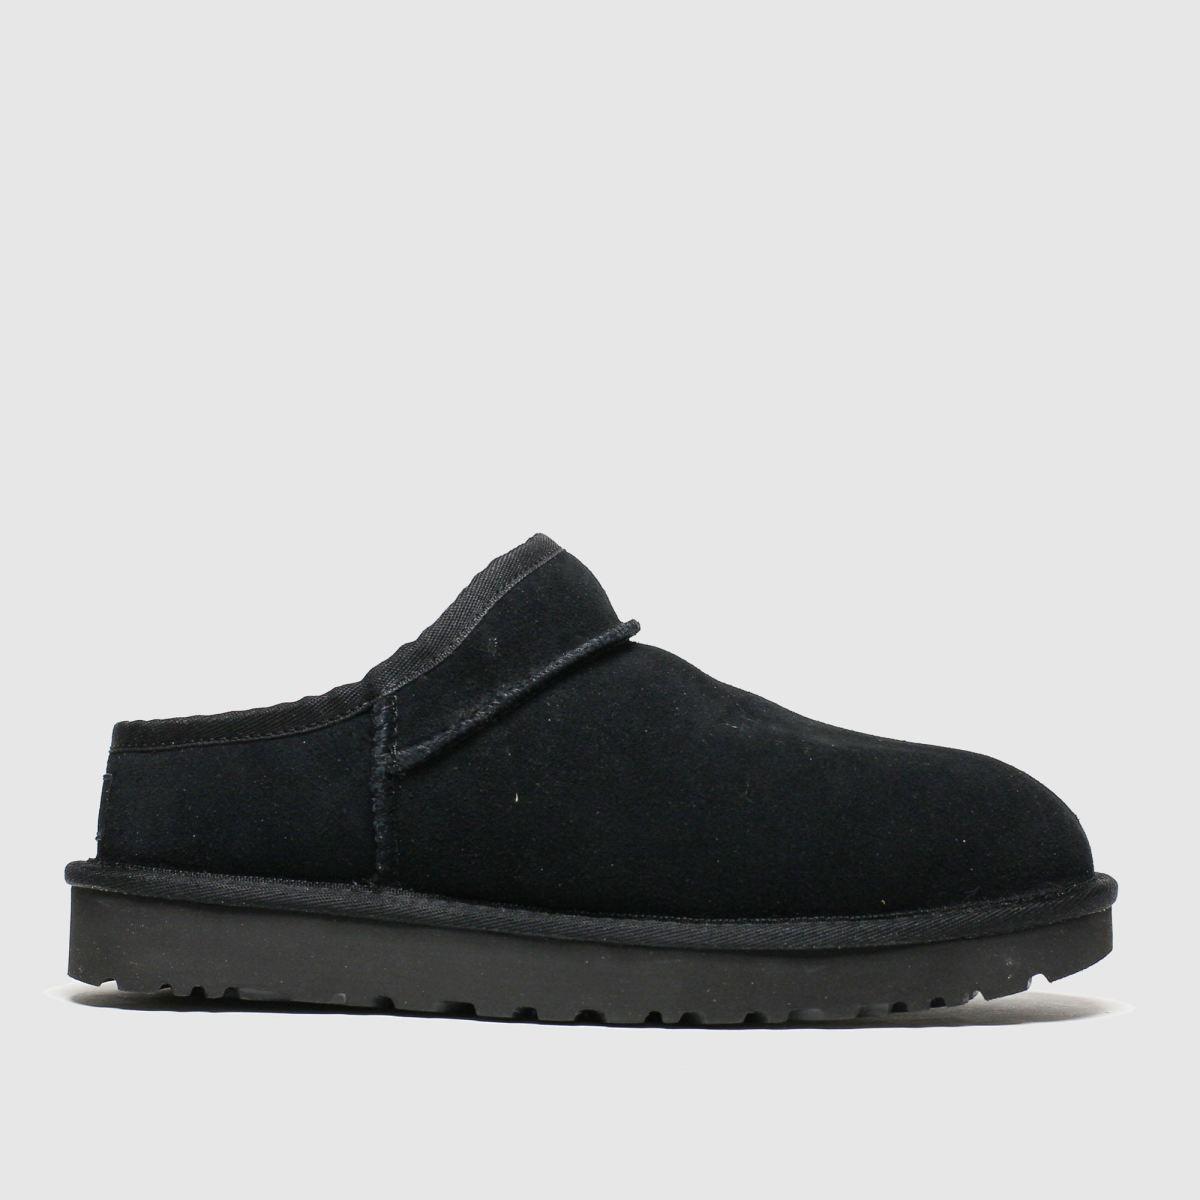 Ugg Black Classic Slipper Slippers